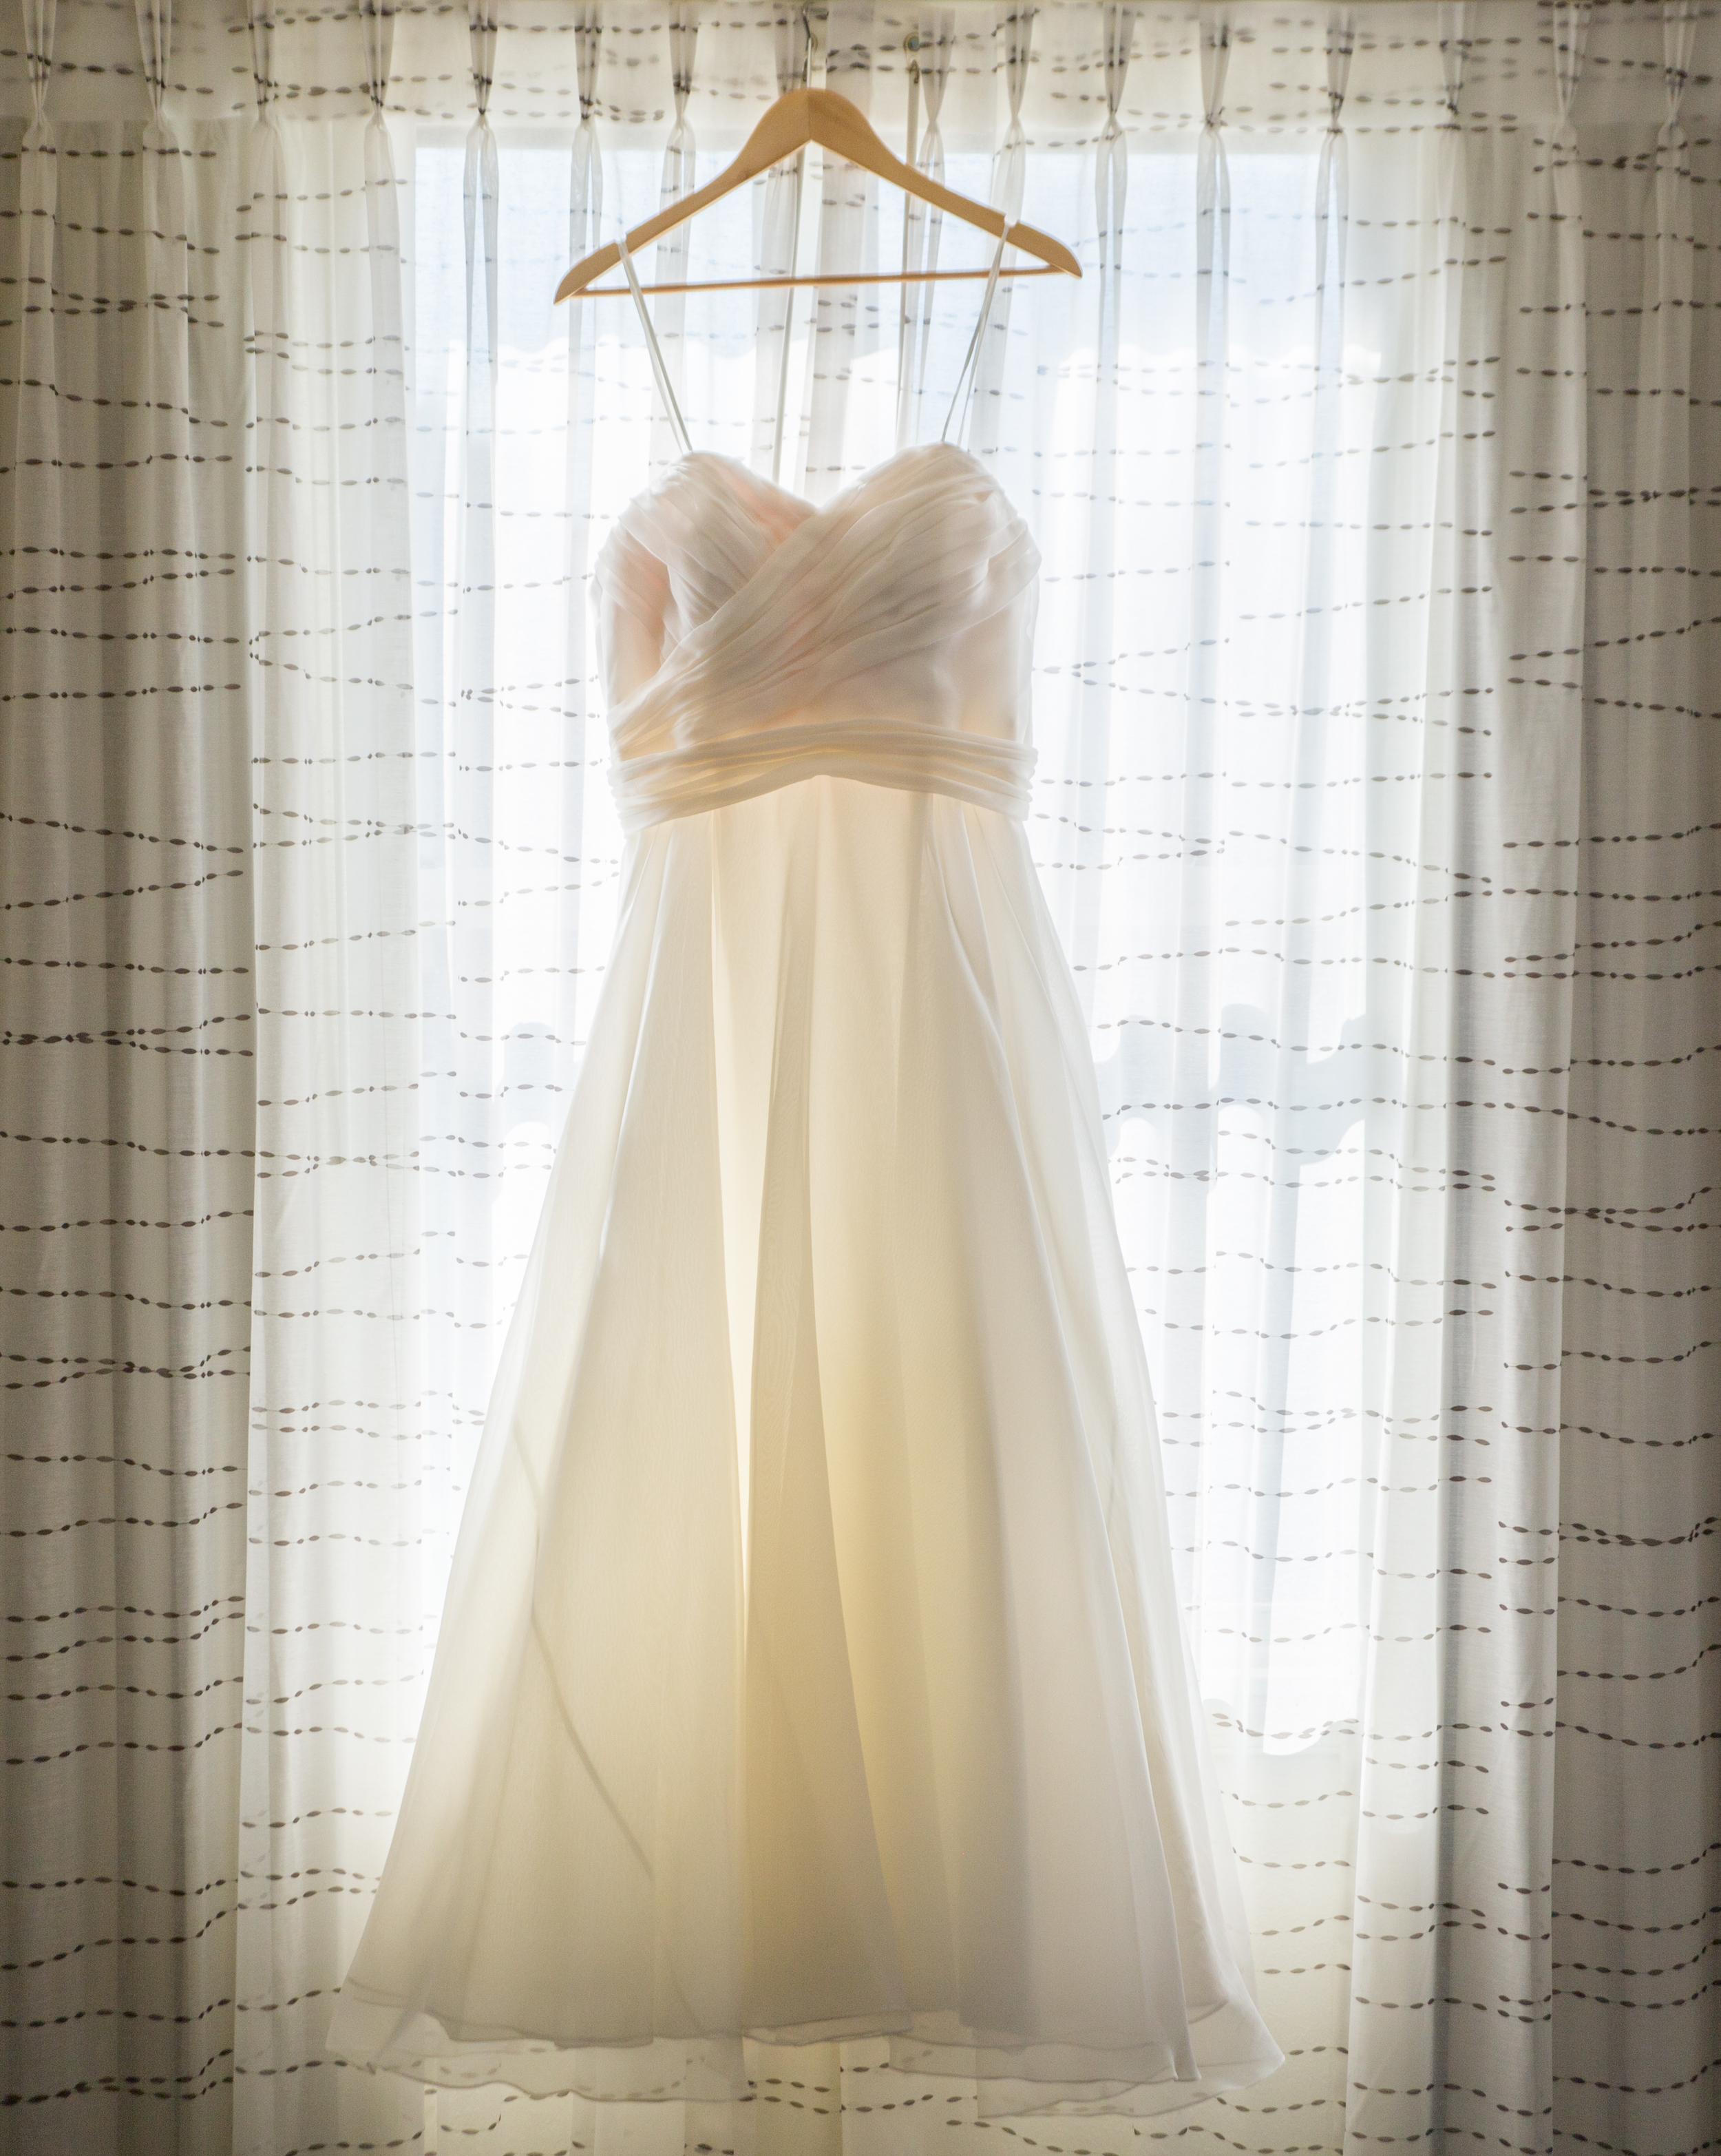 wedding dress window backlit